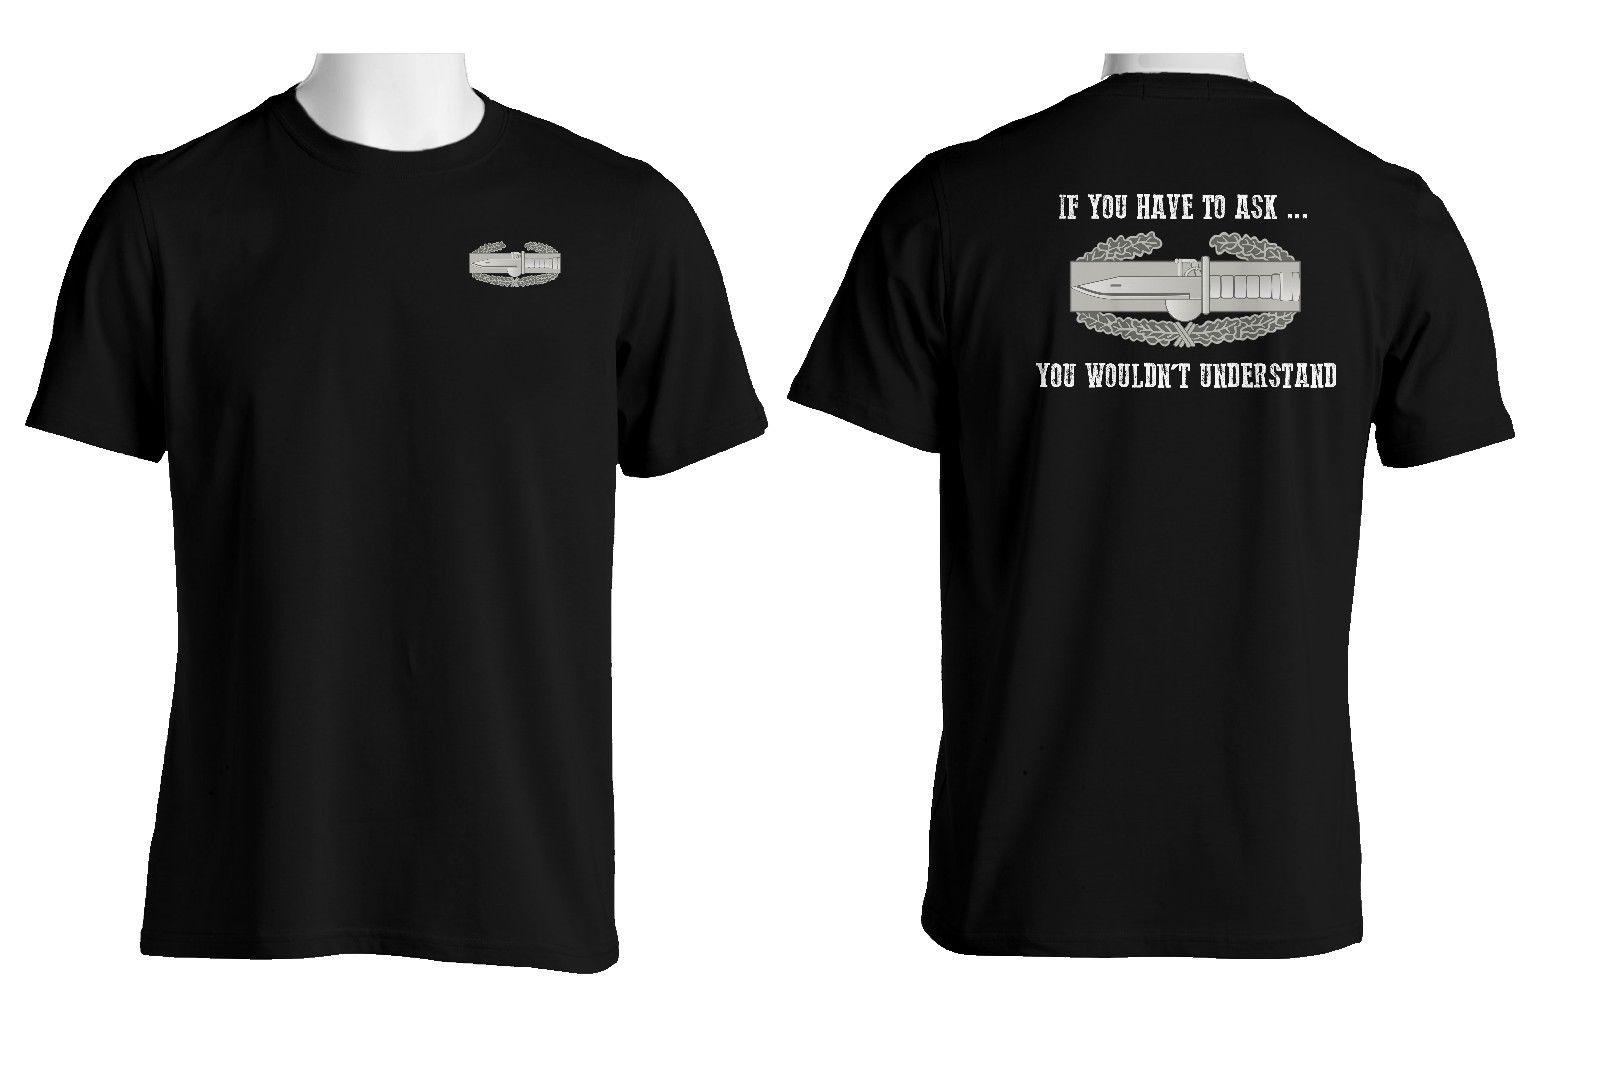 2018 Summer Hot Sale Men T-shirt US Army Combat Action Badge (CAB) Cotton Shirt-1822